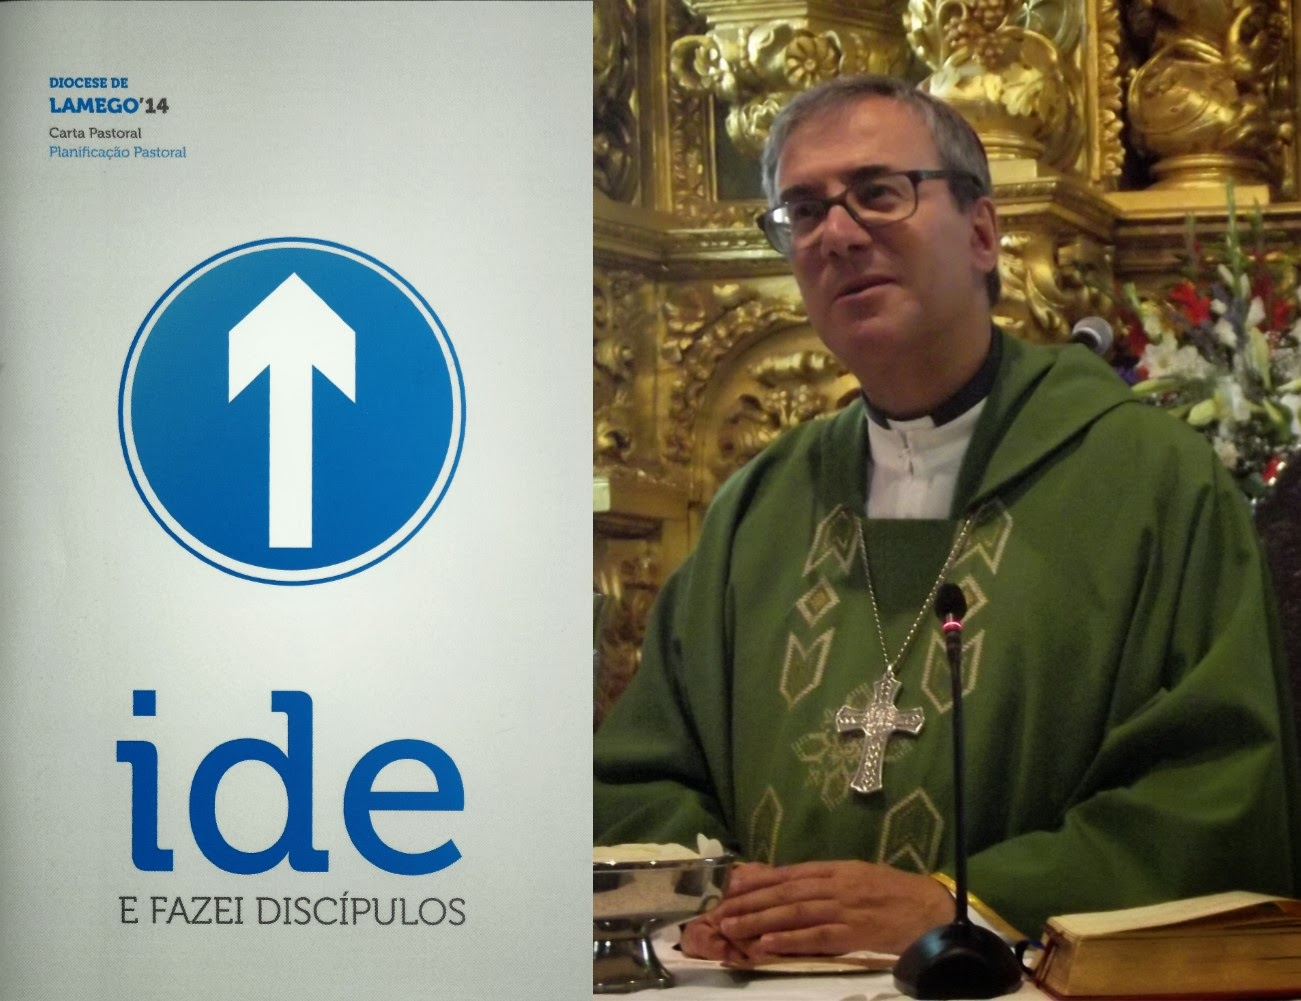 http://www.tbcparoquia.com/dlds/Carta_Pastoral2014_D.Antnio_J_R_Couto.pdf